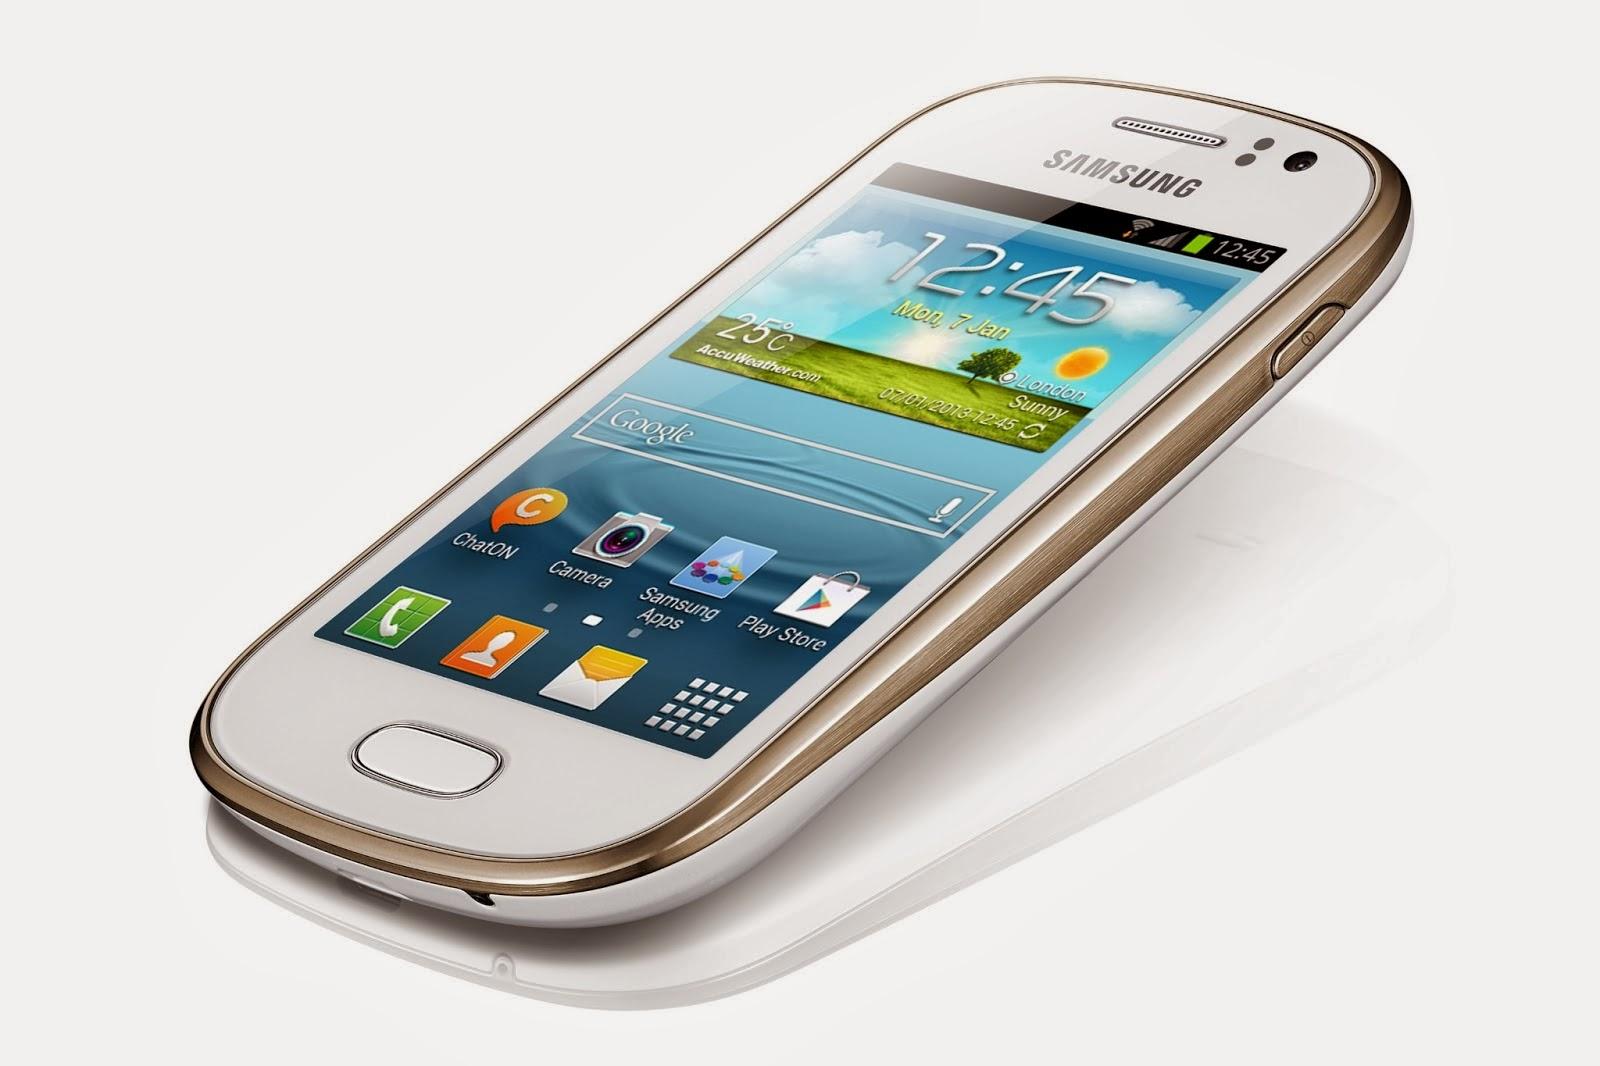 Harga Hp Samsung Galaxy Fame Terbaru Update 2015